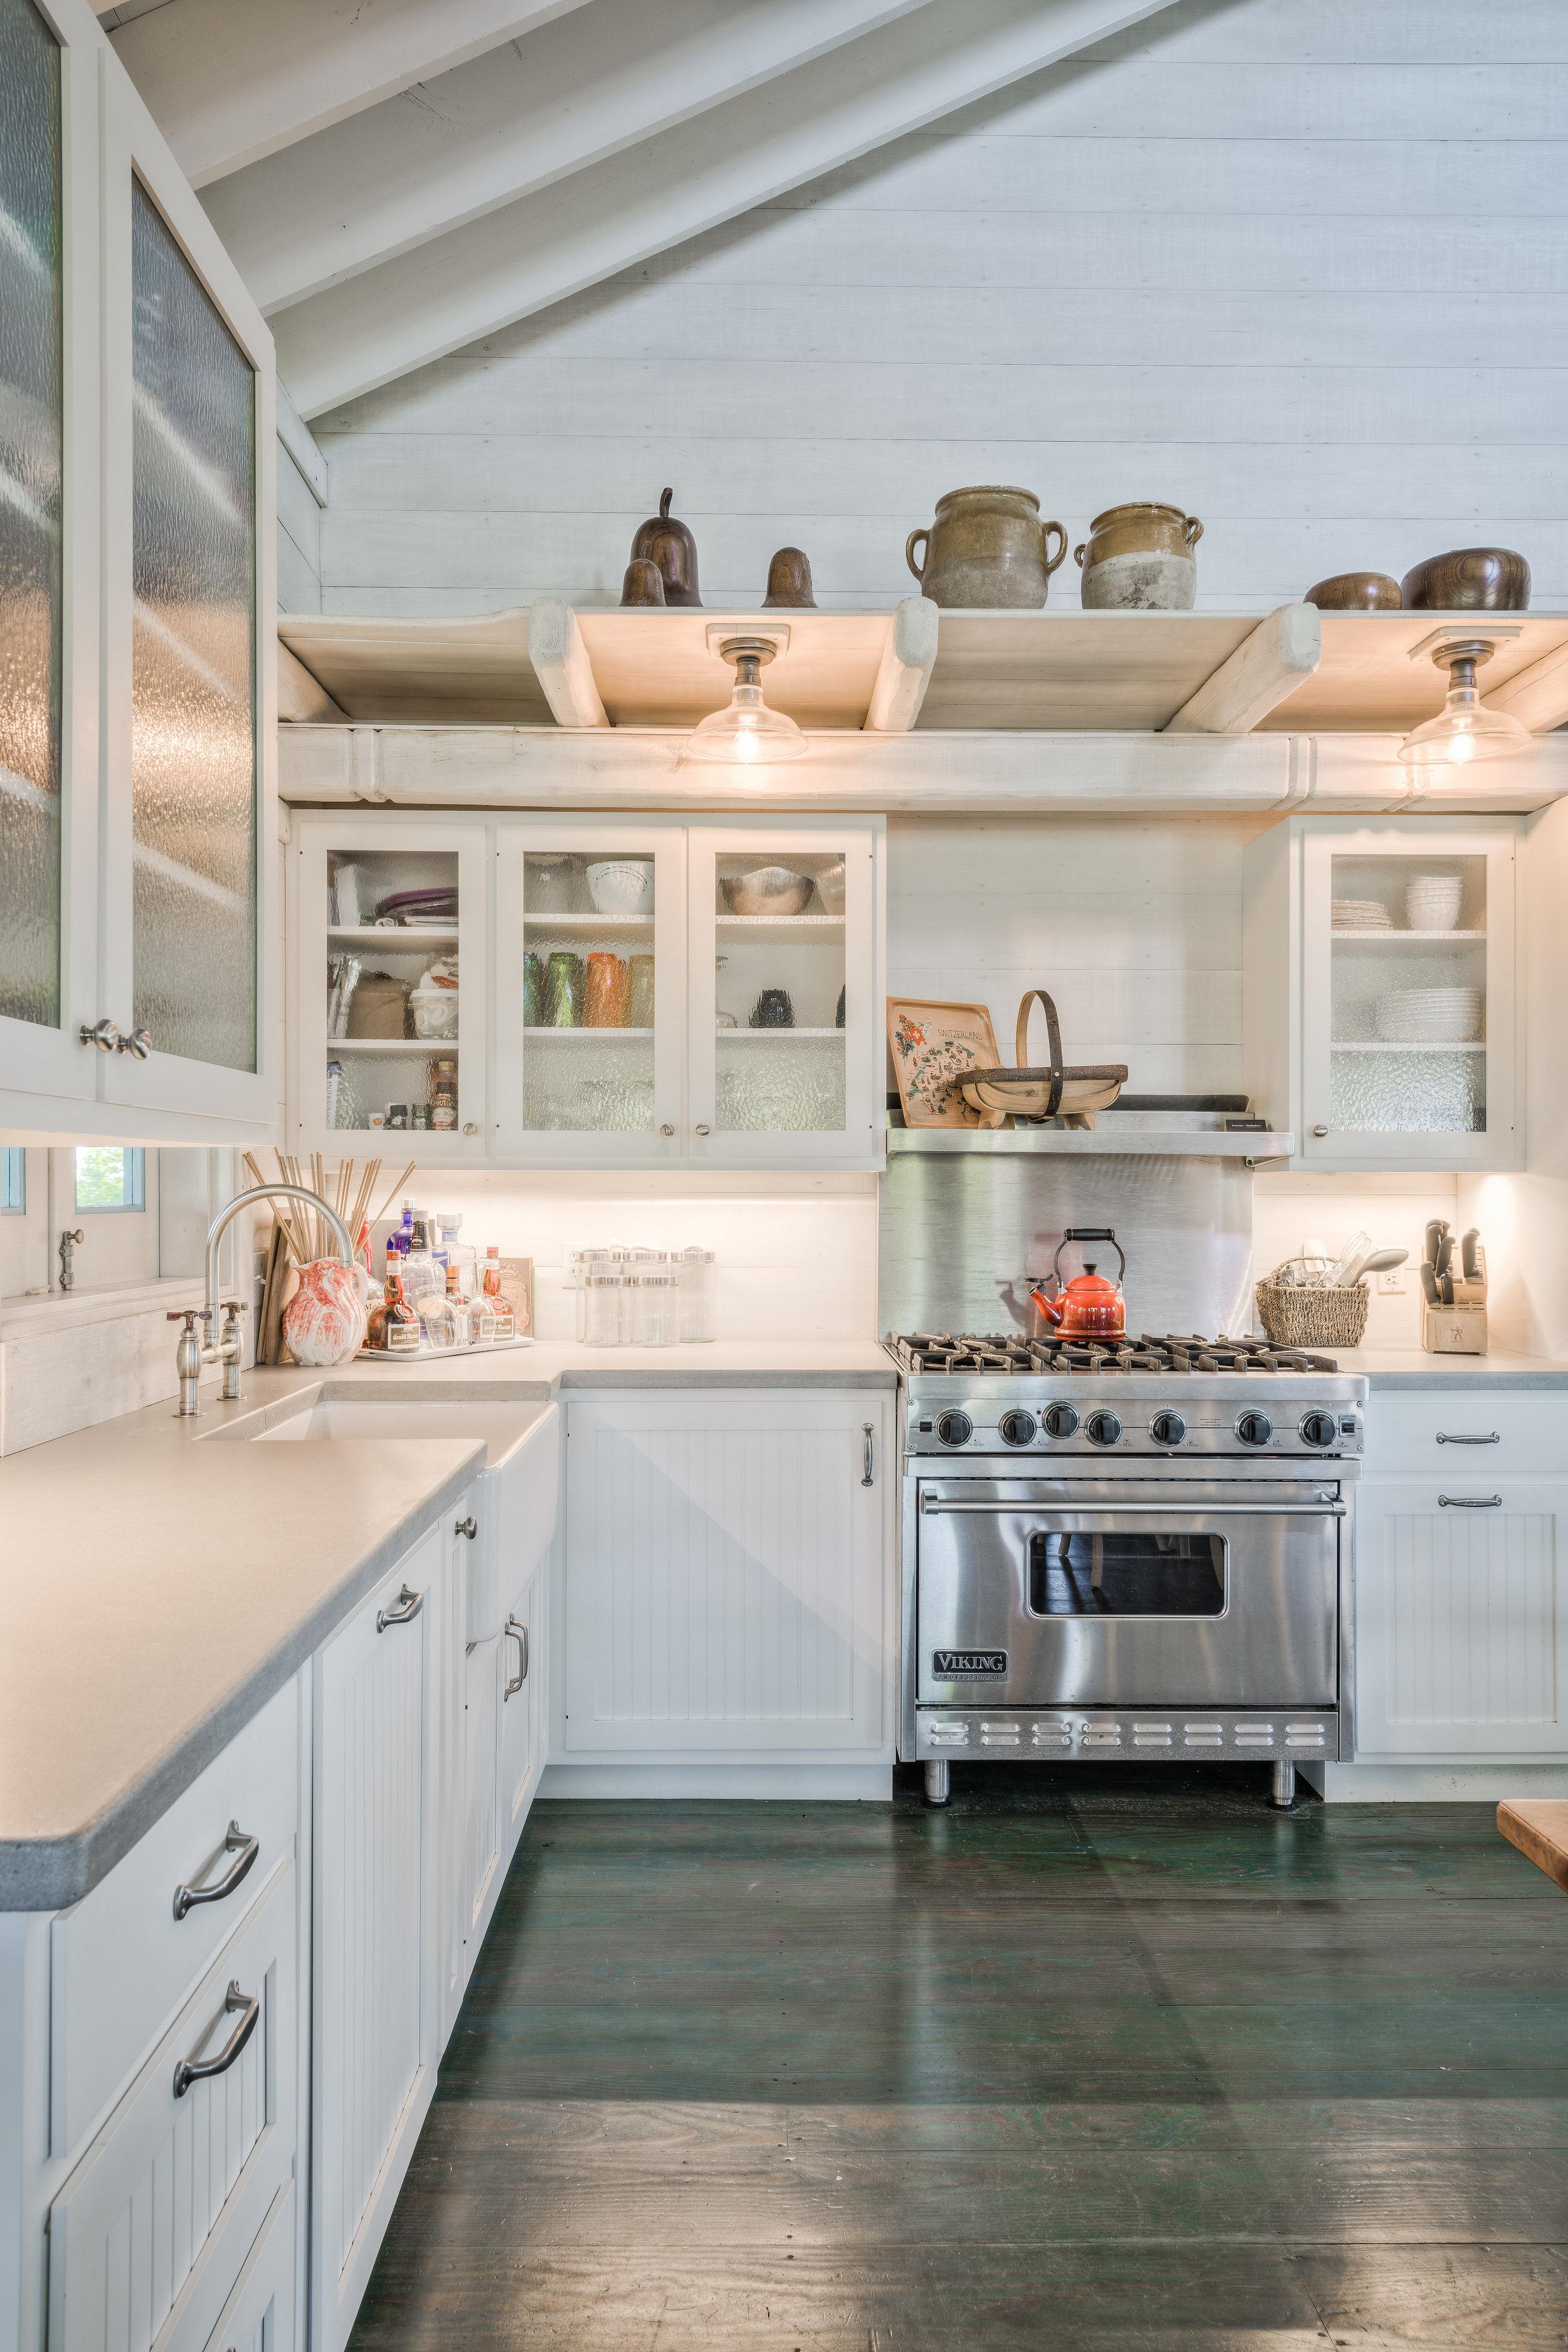 Rustic Tropical Paradise Open-Concept Kitchen Space – Detail